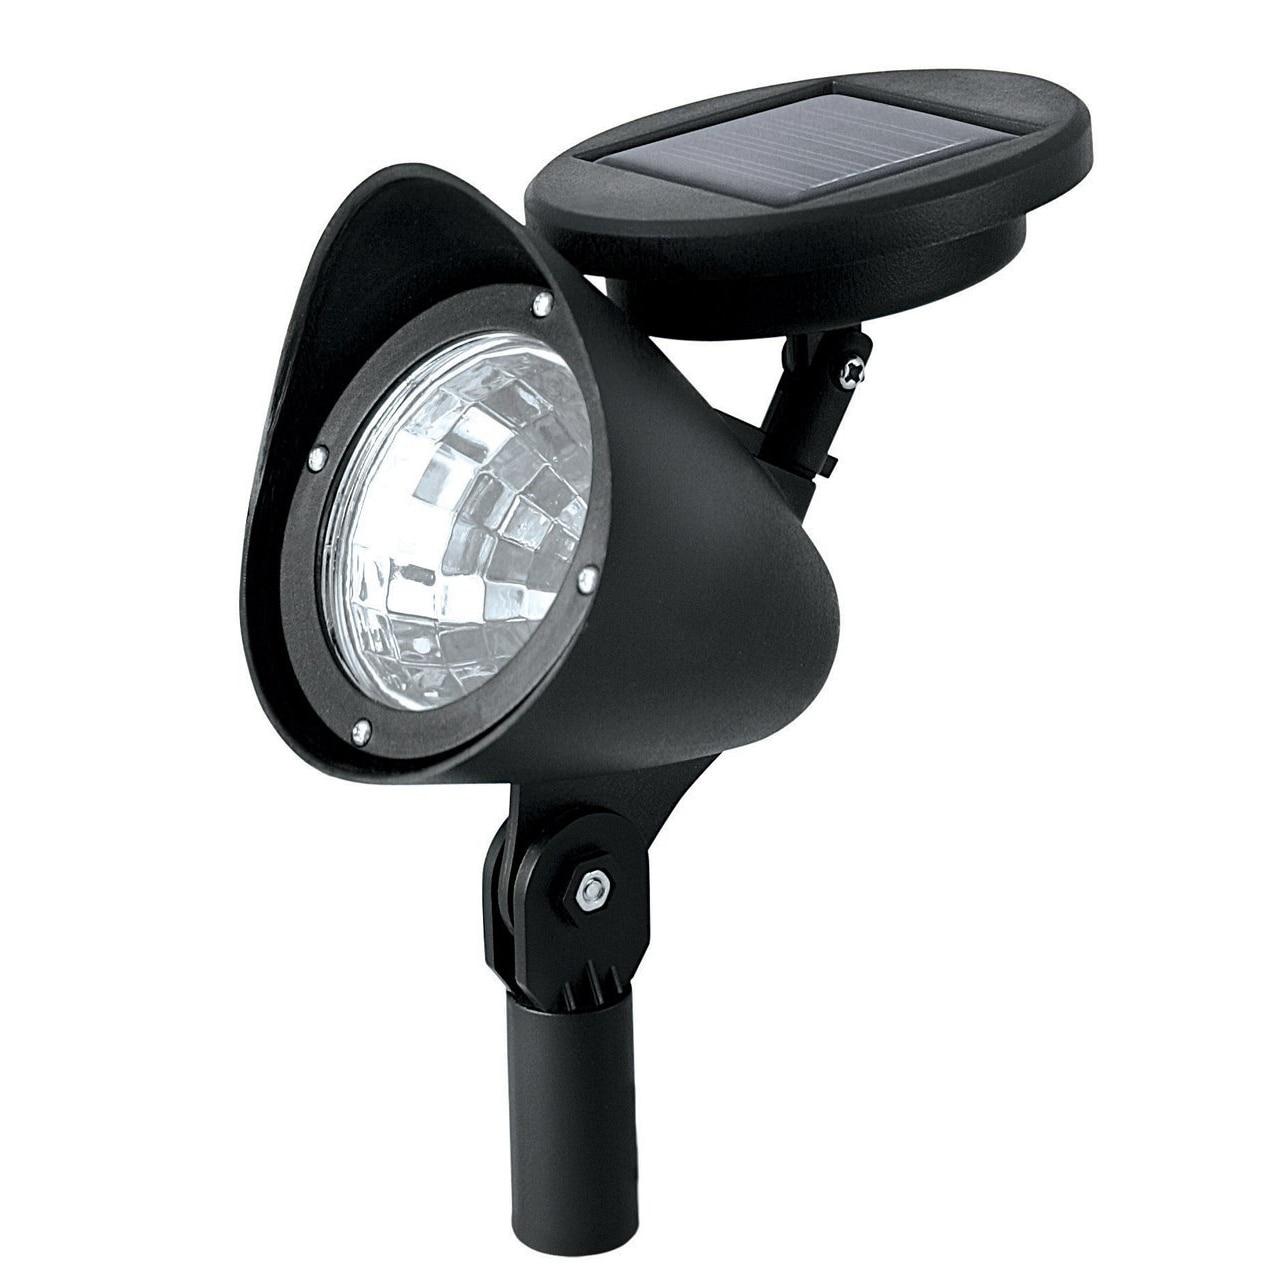 Bestselling Outdoor Solar Powered LED Spotlight Garden Pool Waterproof Spot Light Lamp